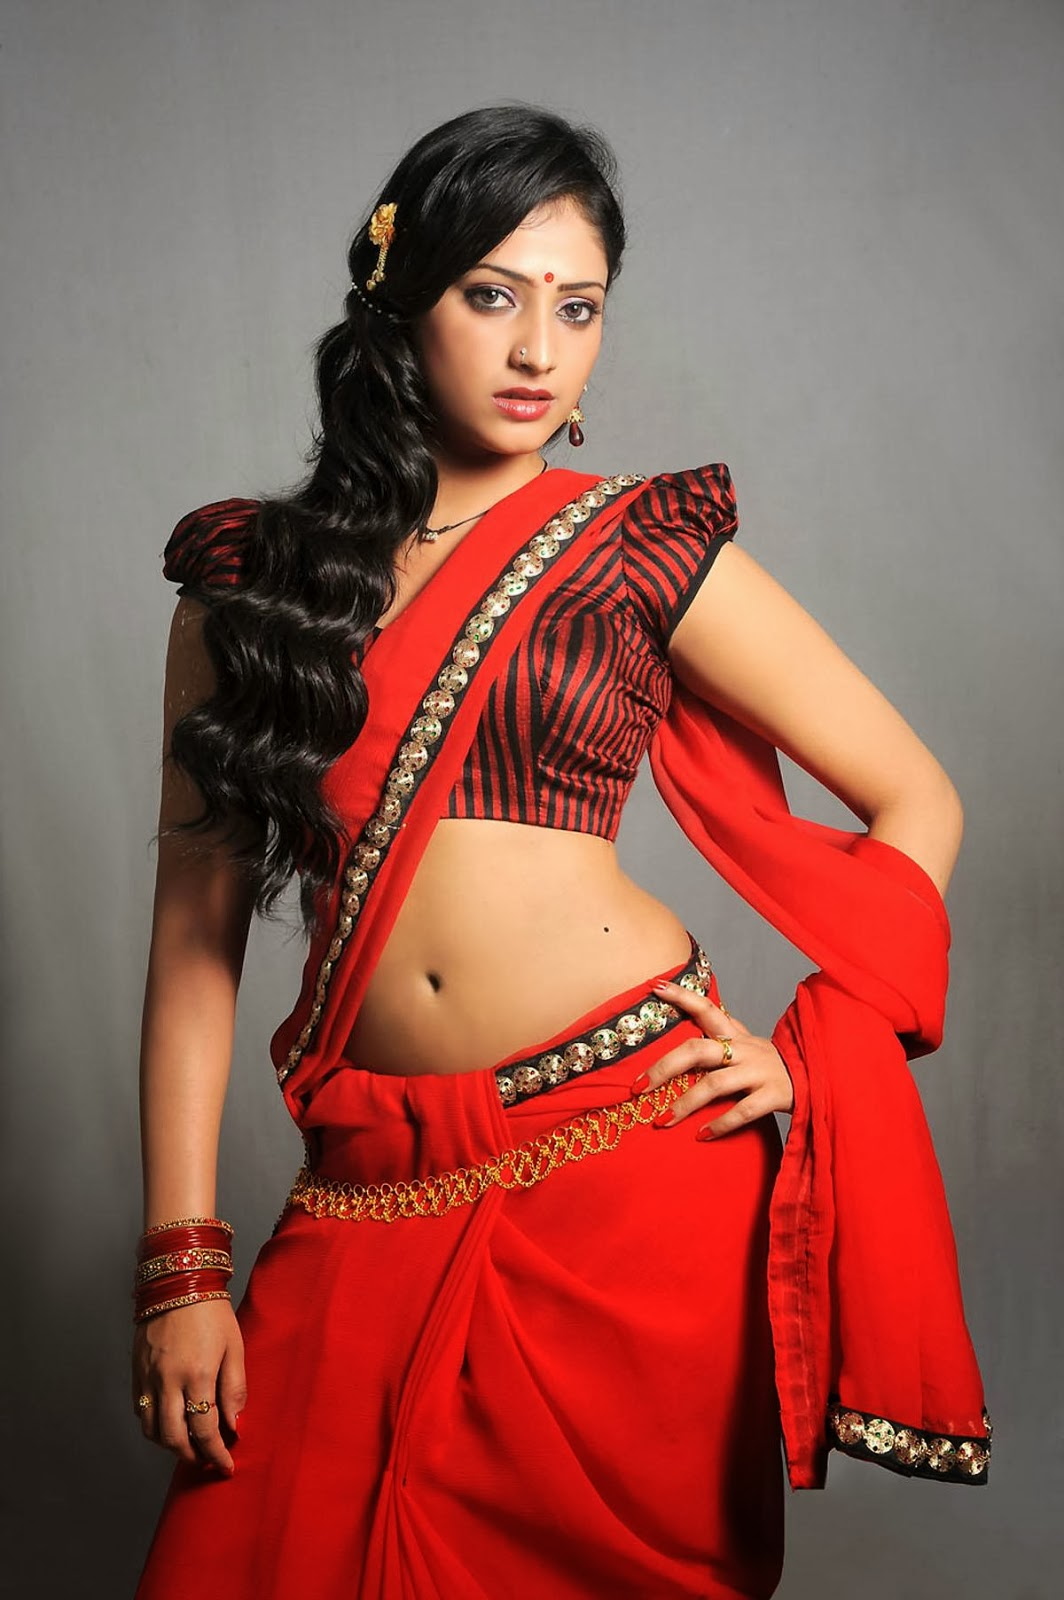 indian celebrities sex tube